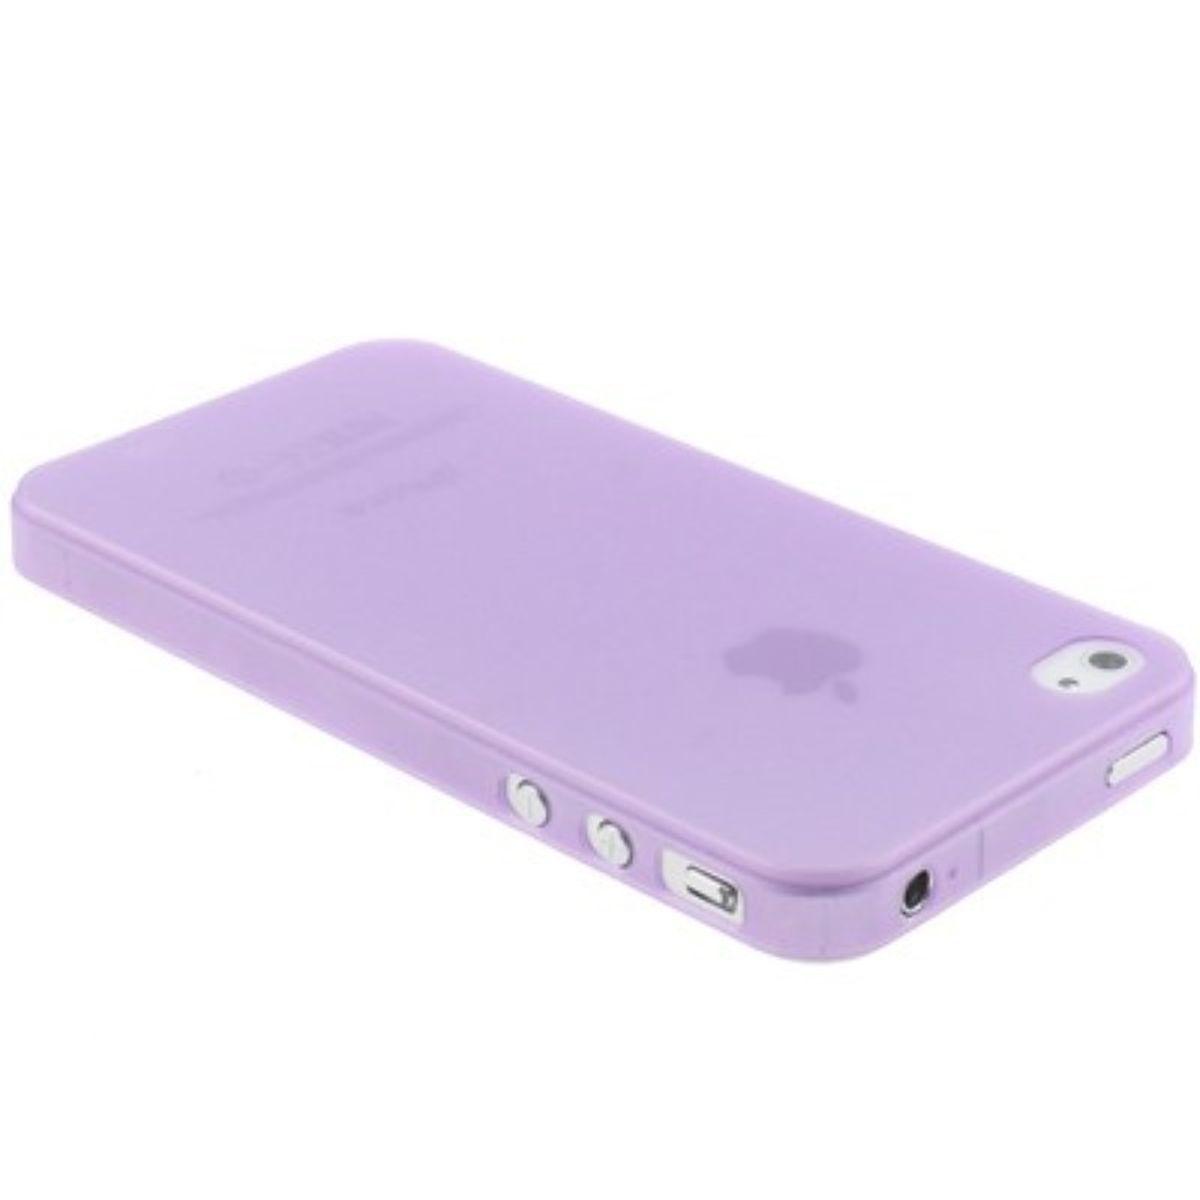 Schutzhülle Case TPU für Handy iPhone 4 / 4s Transparent / Lila